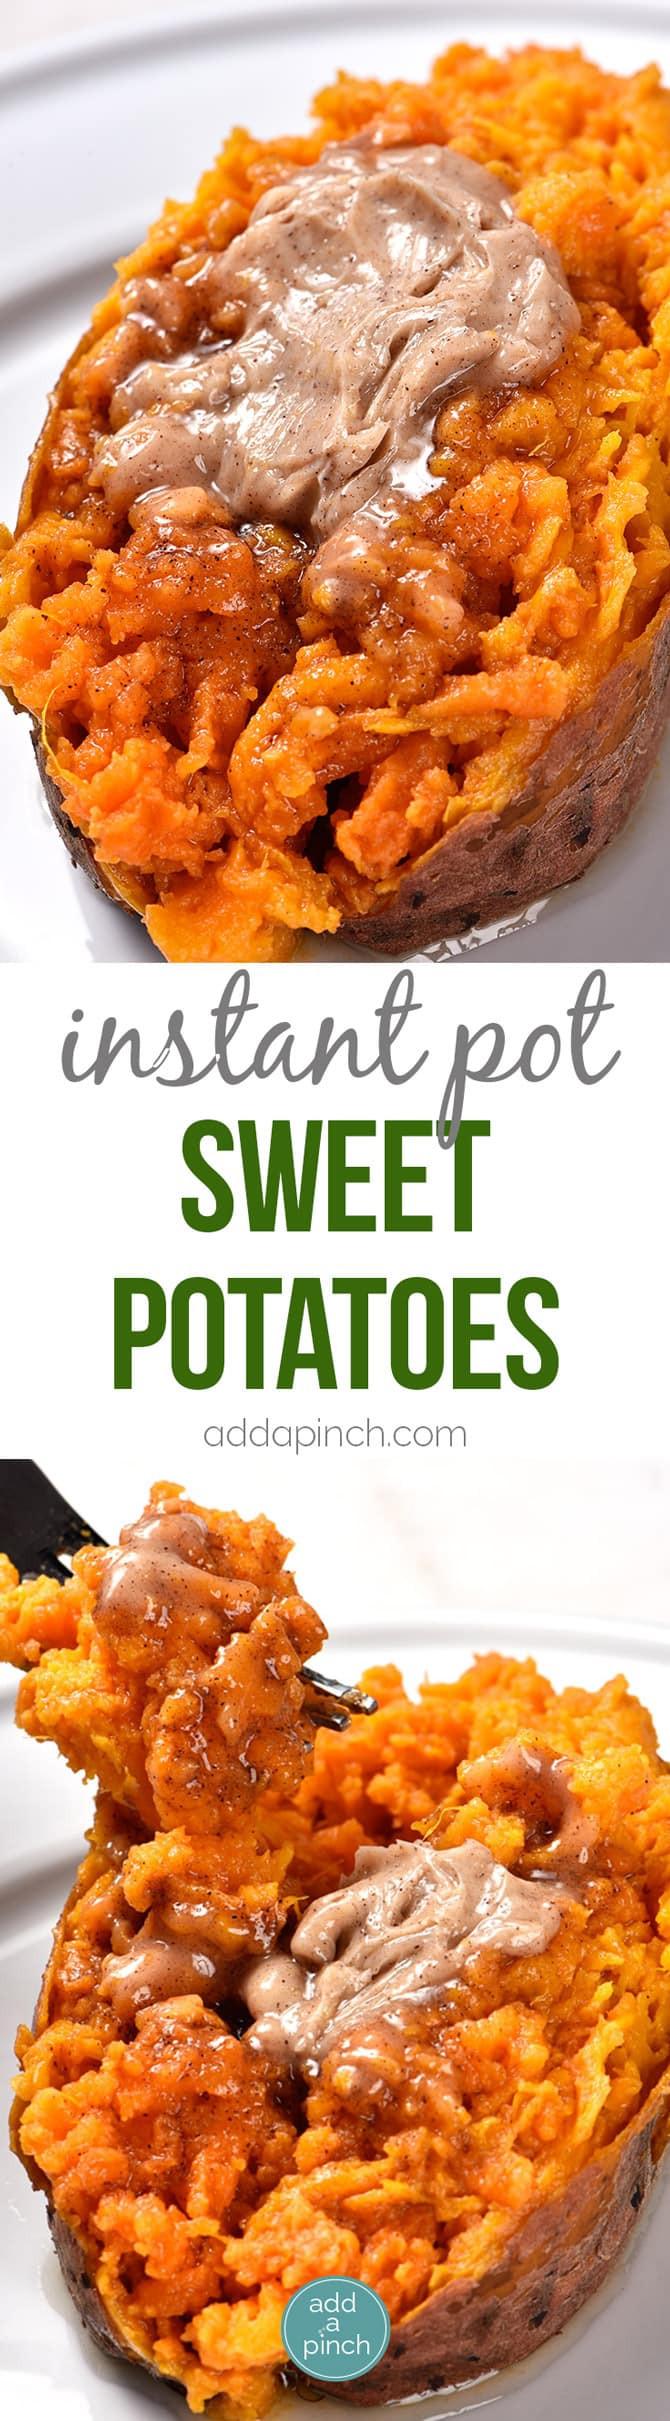 Instant Pot Sweet Potato Casserole  Instant Pot Sweet Potatoes Recipe Add a Pinch